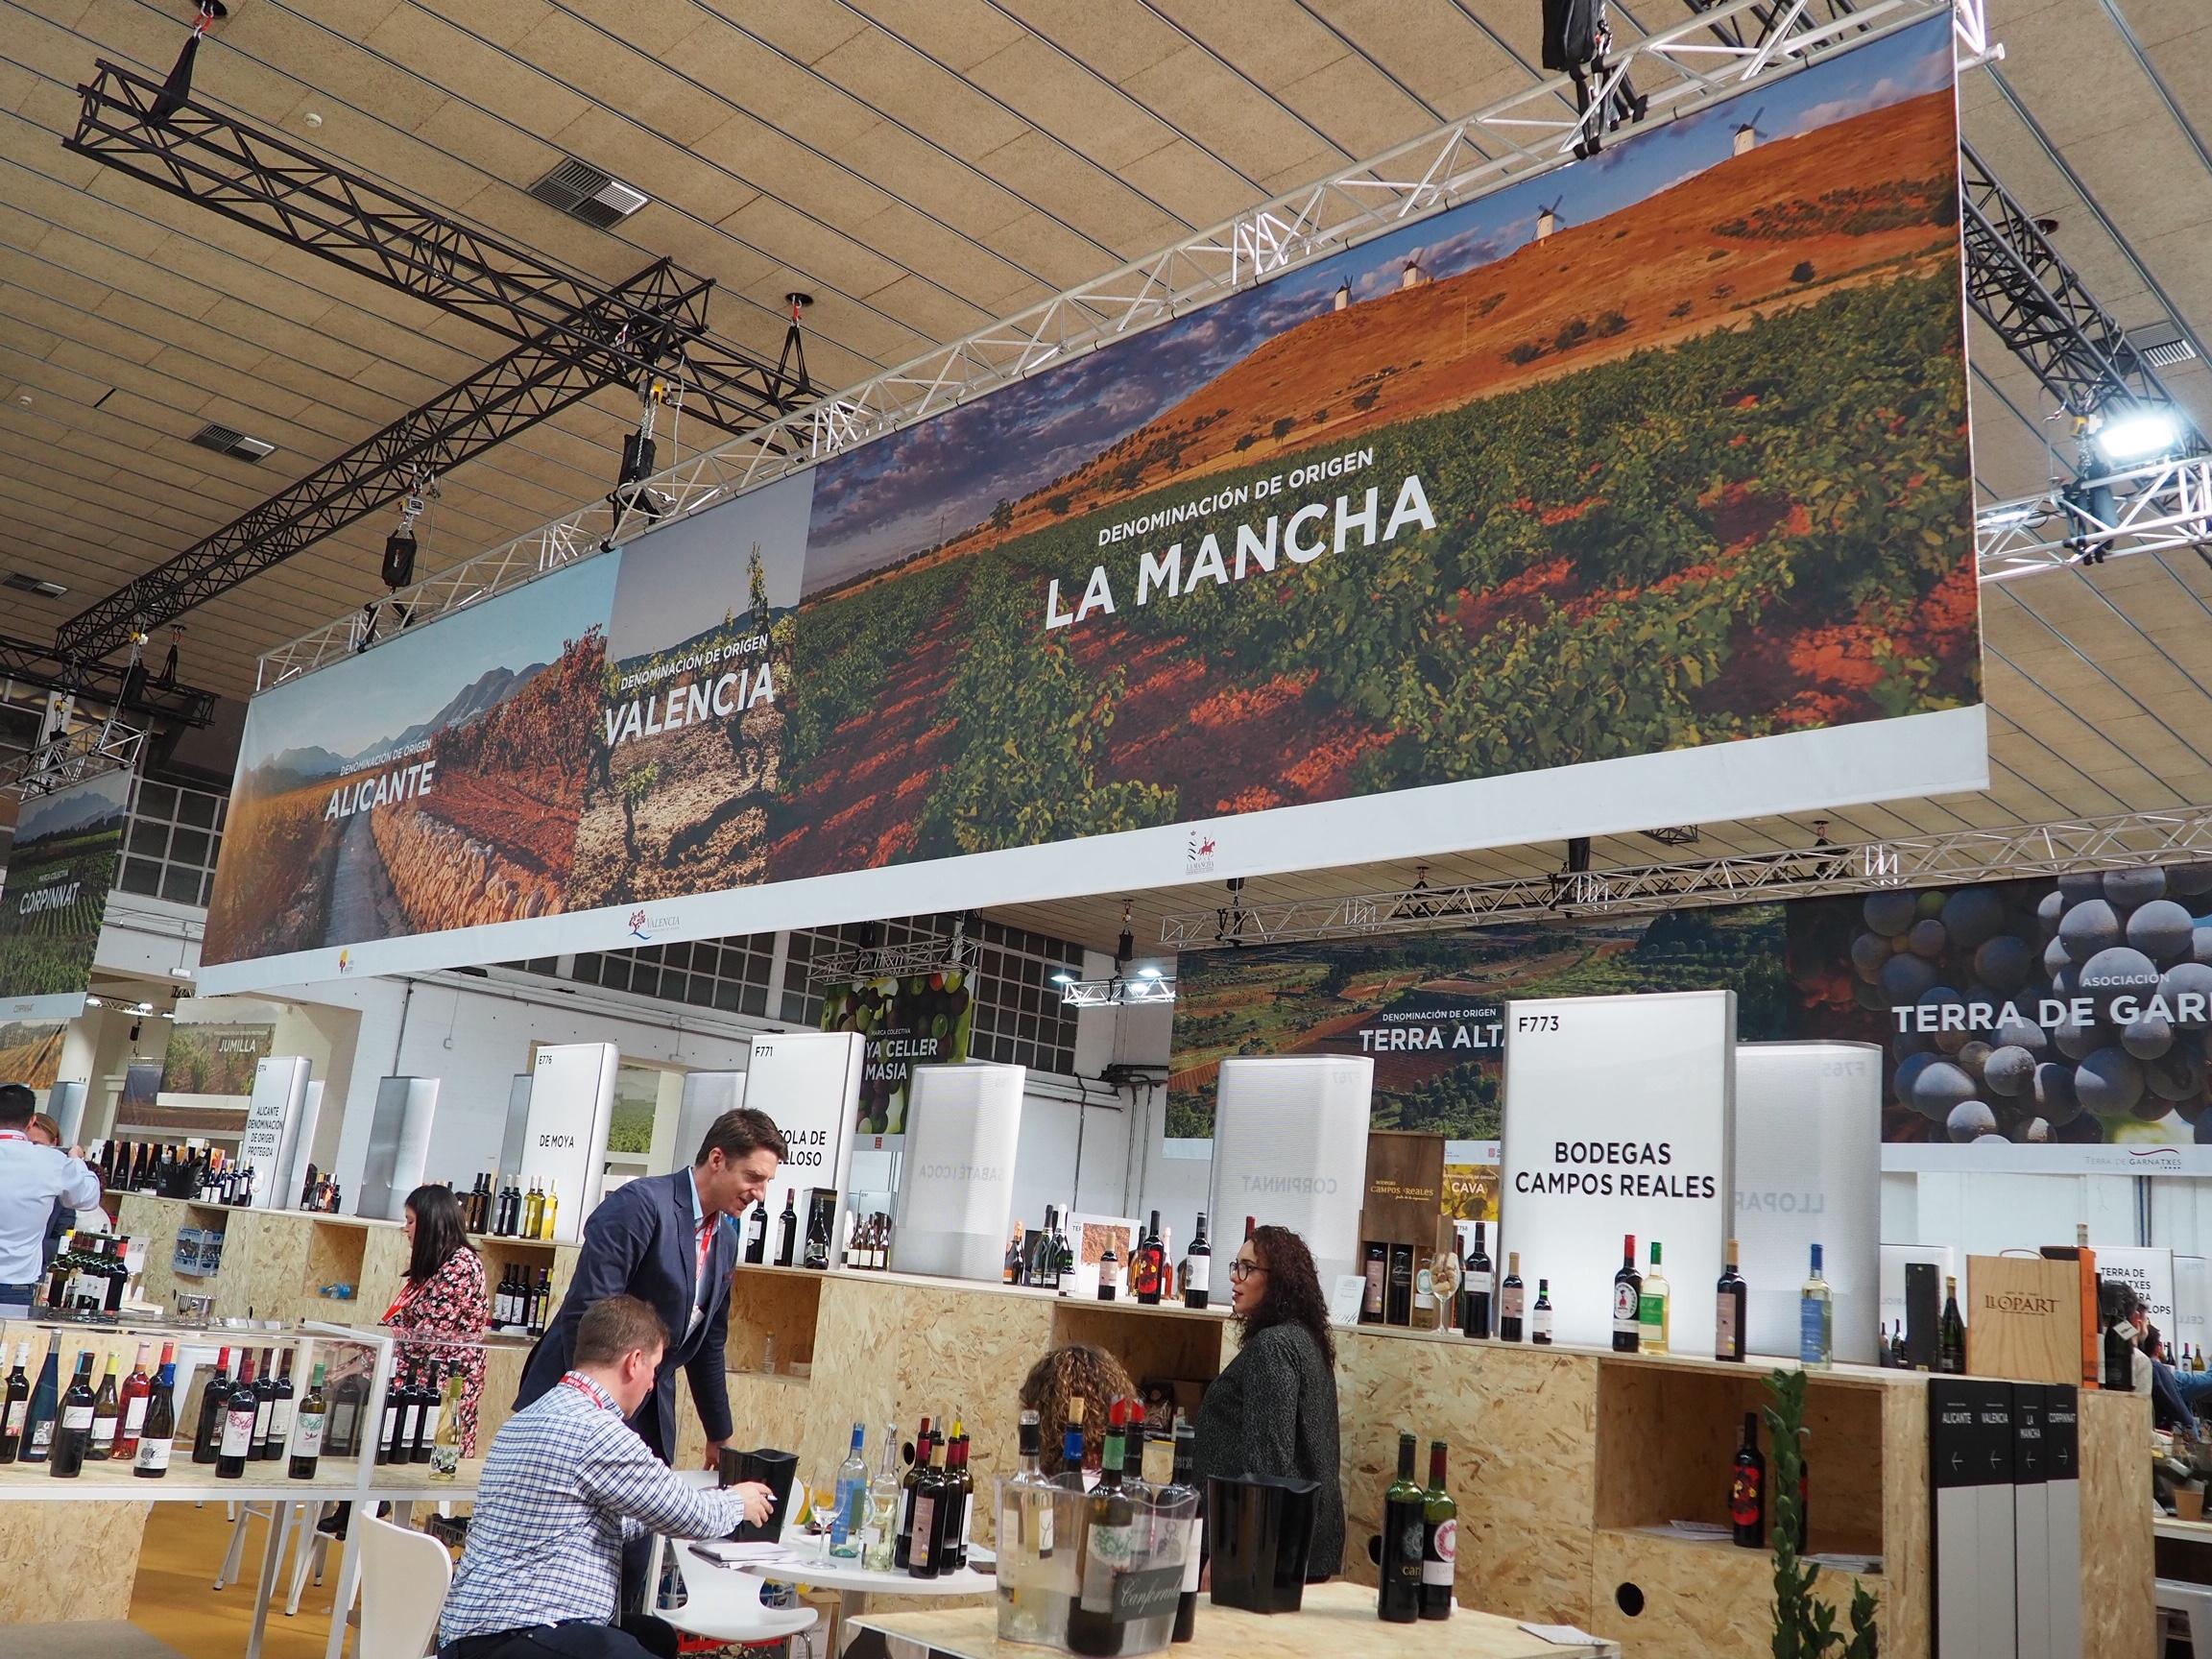 vinos de la mancha - Barcelona Wine Week